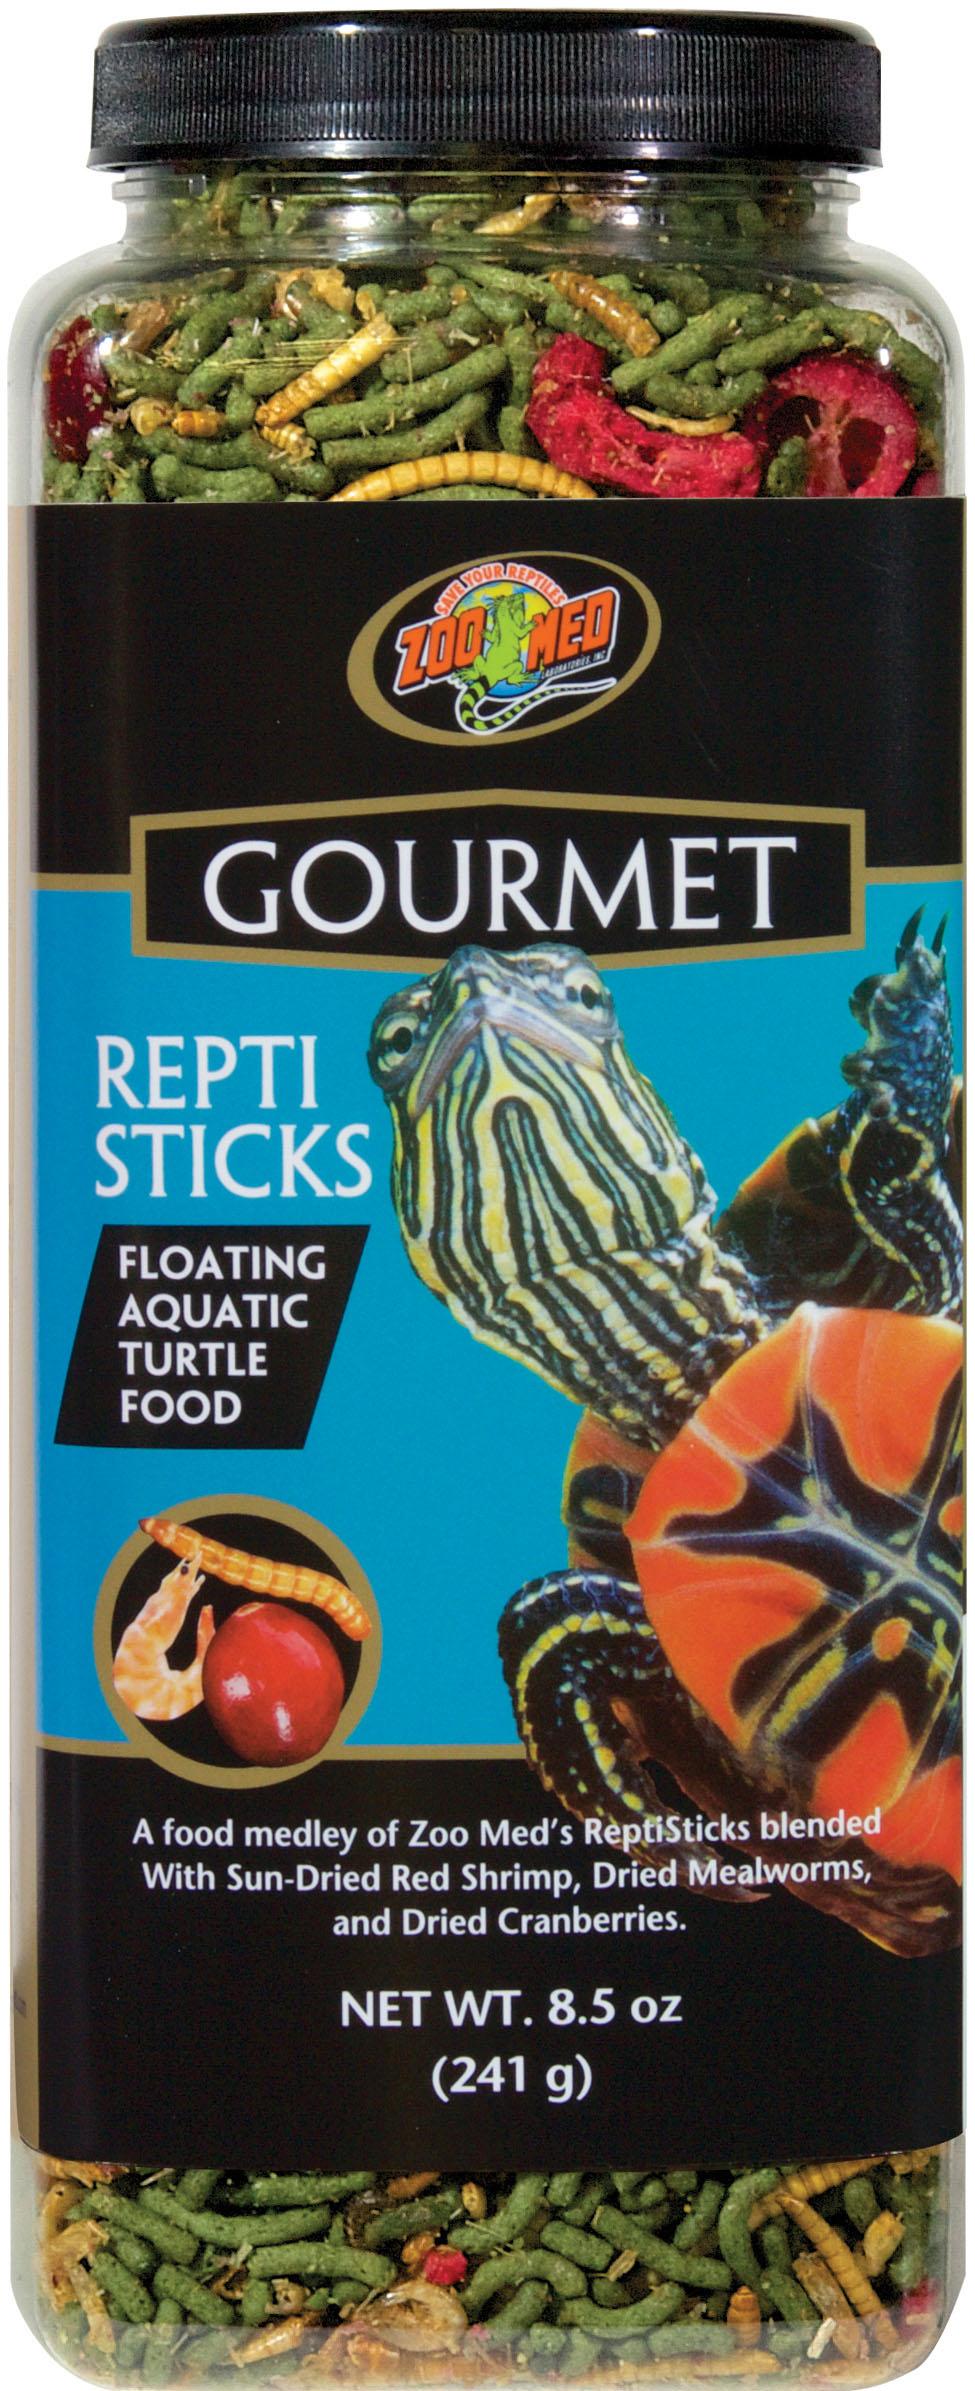 Zoo Med Gourmet ReptiSticks Turtle Food, 8.5-oz bottle